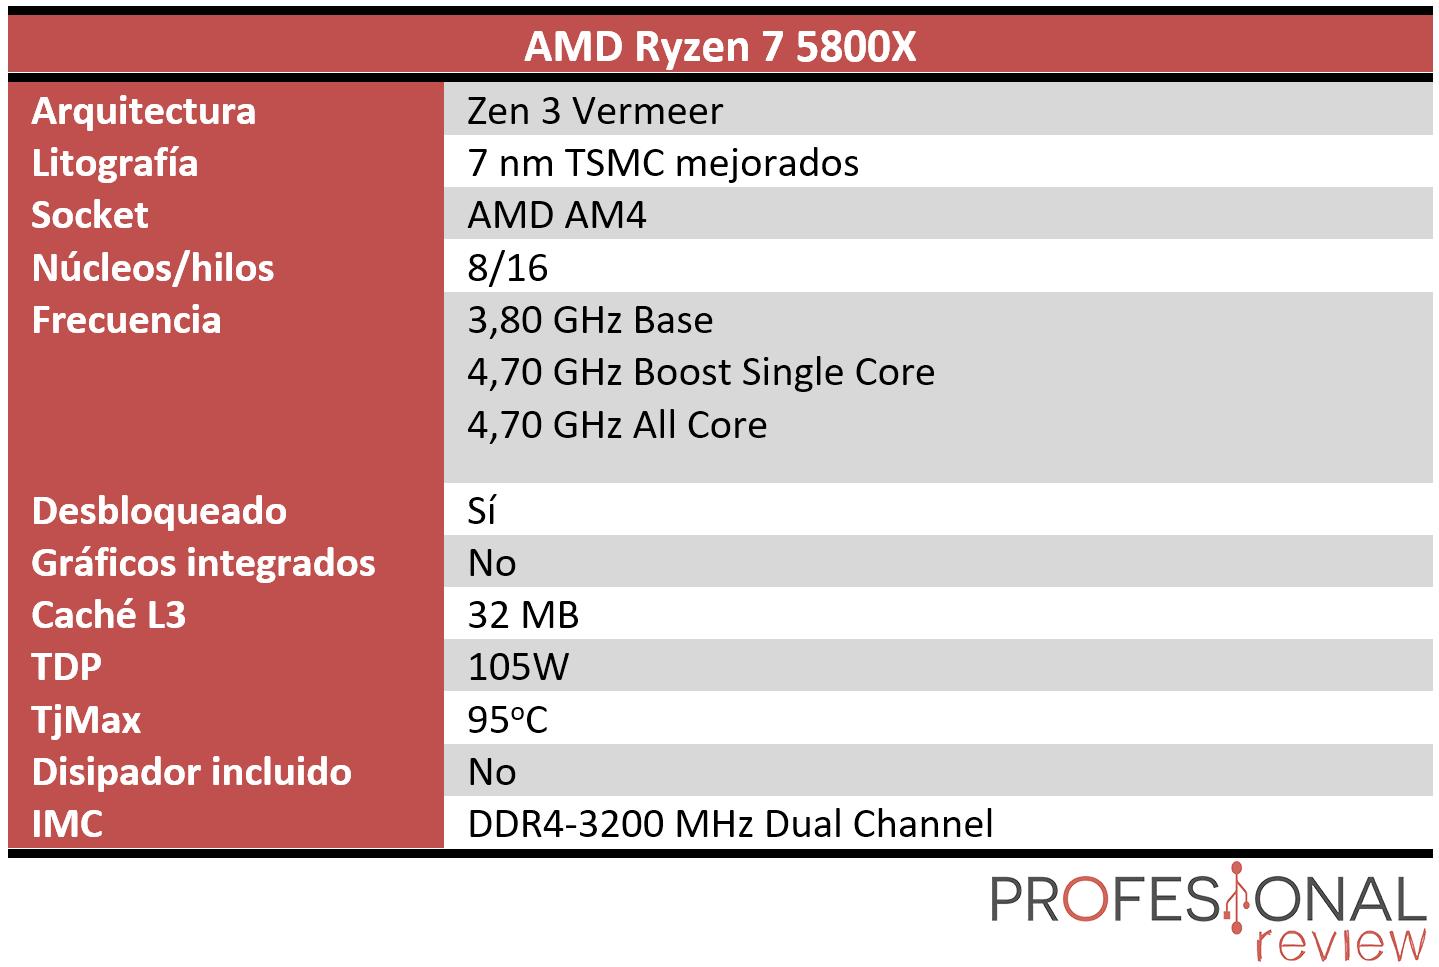 AMD Ryzen 7 5800X Características